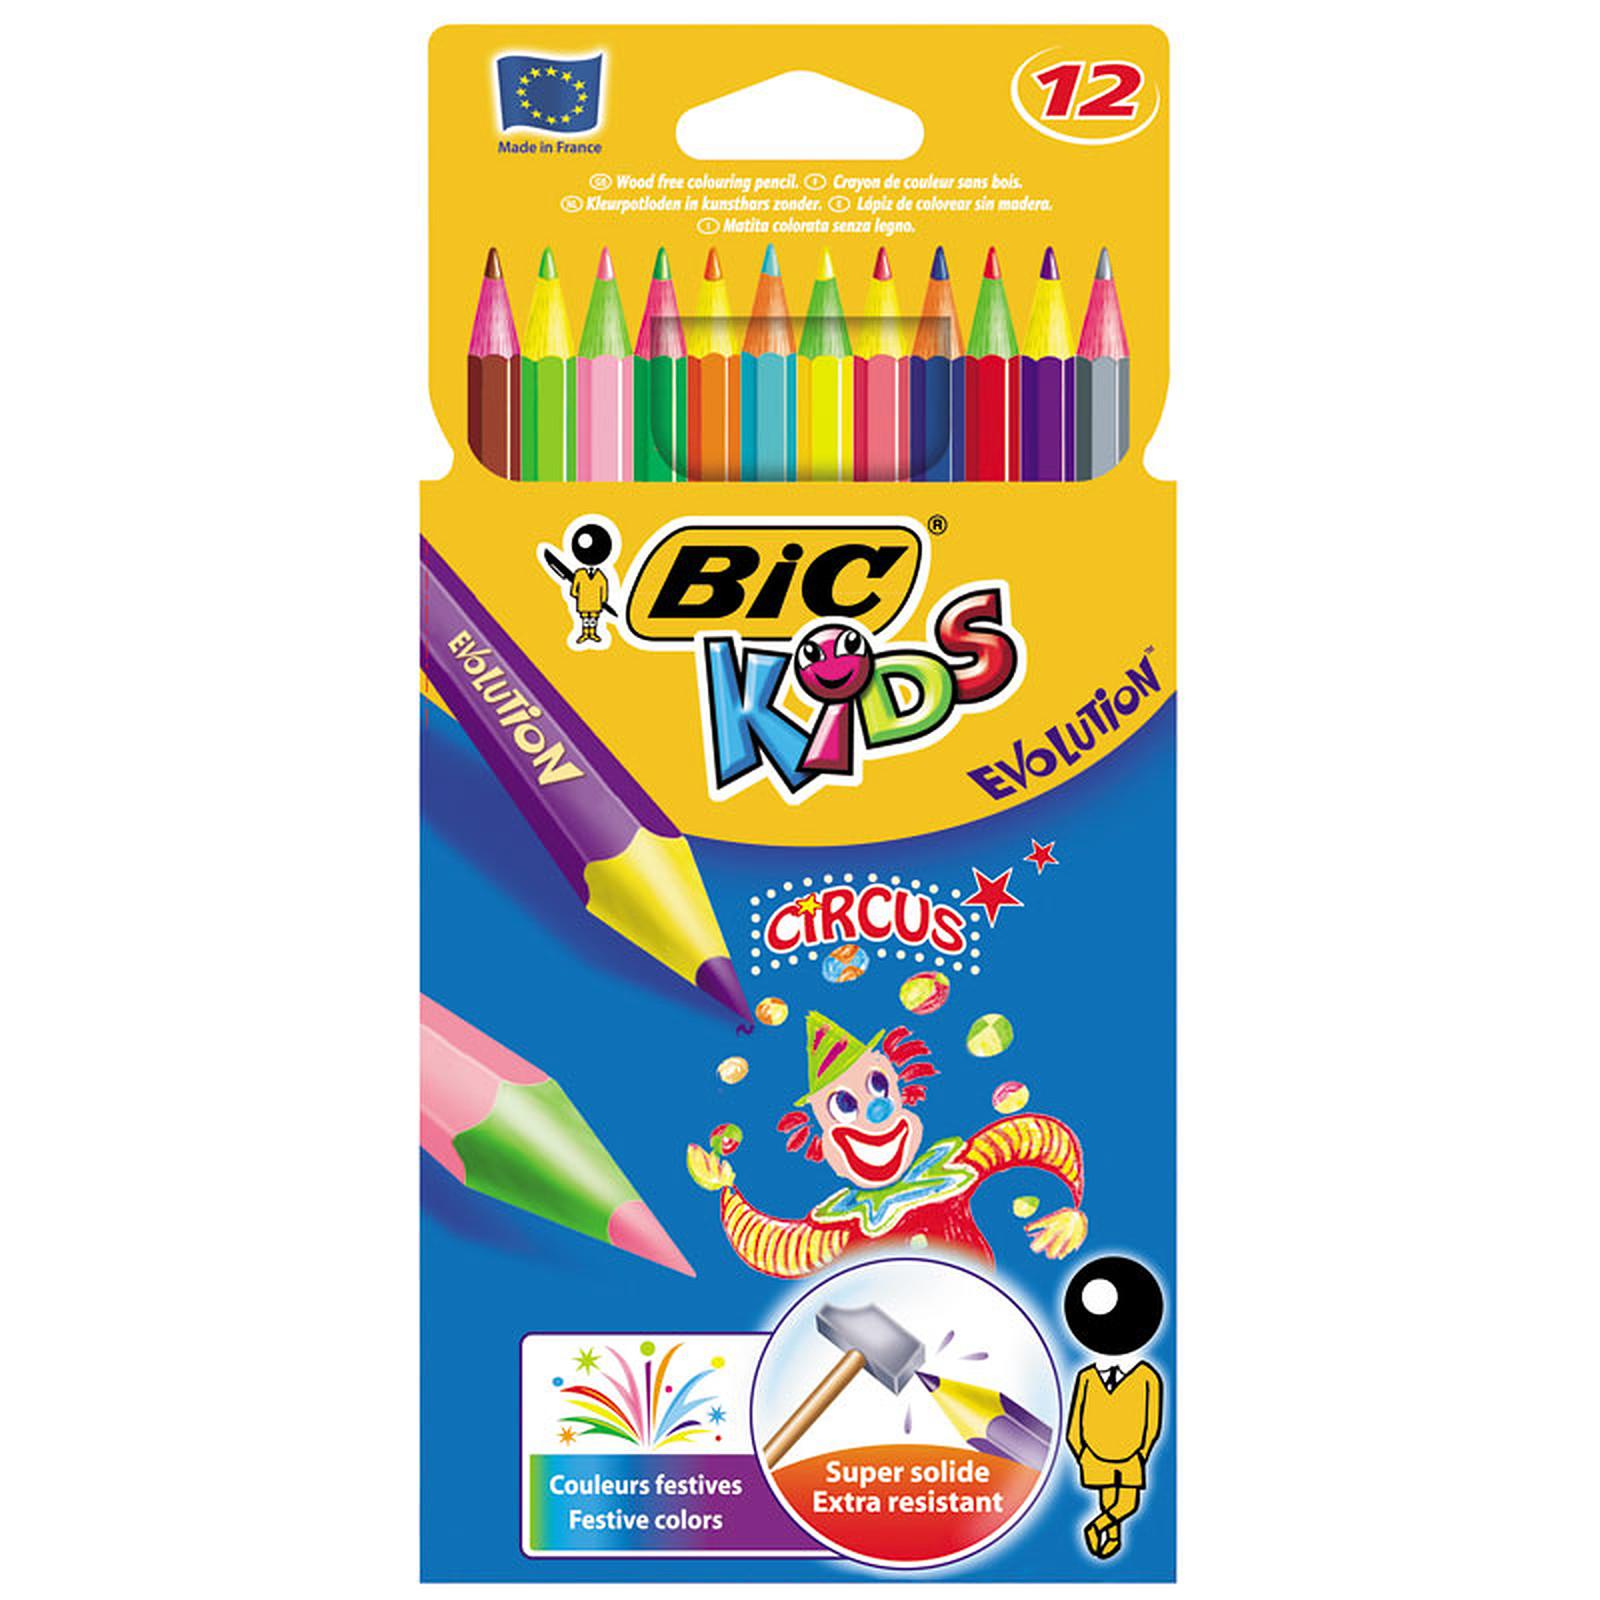 BIC KIDS Evolution boite de 12